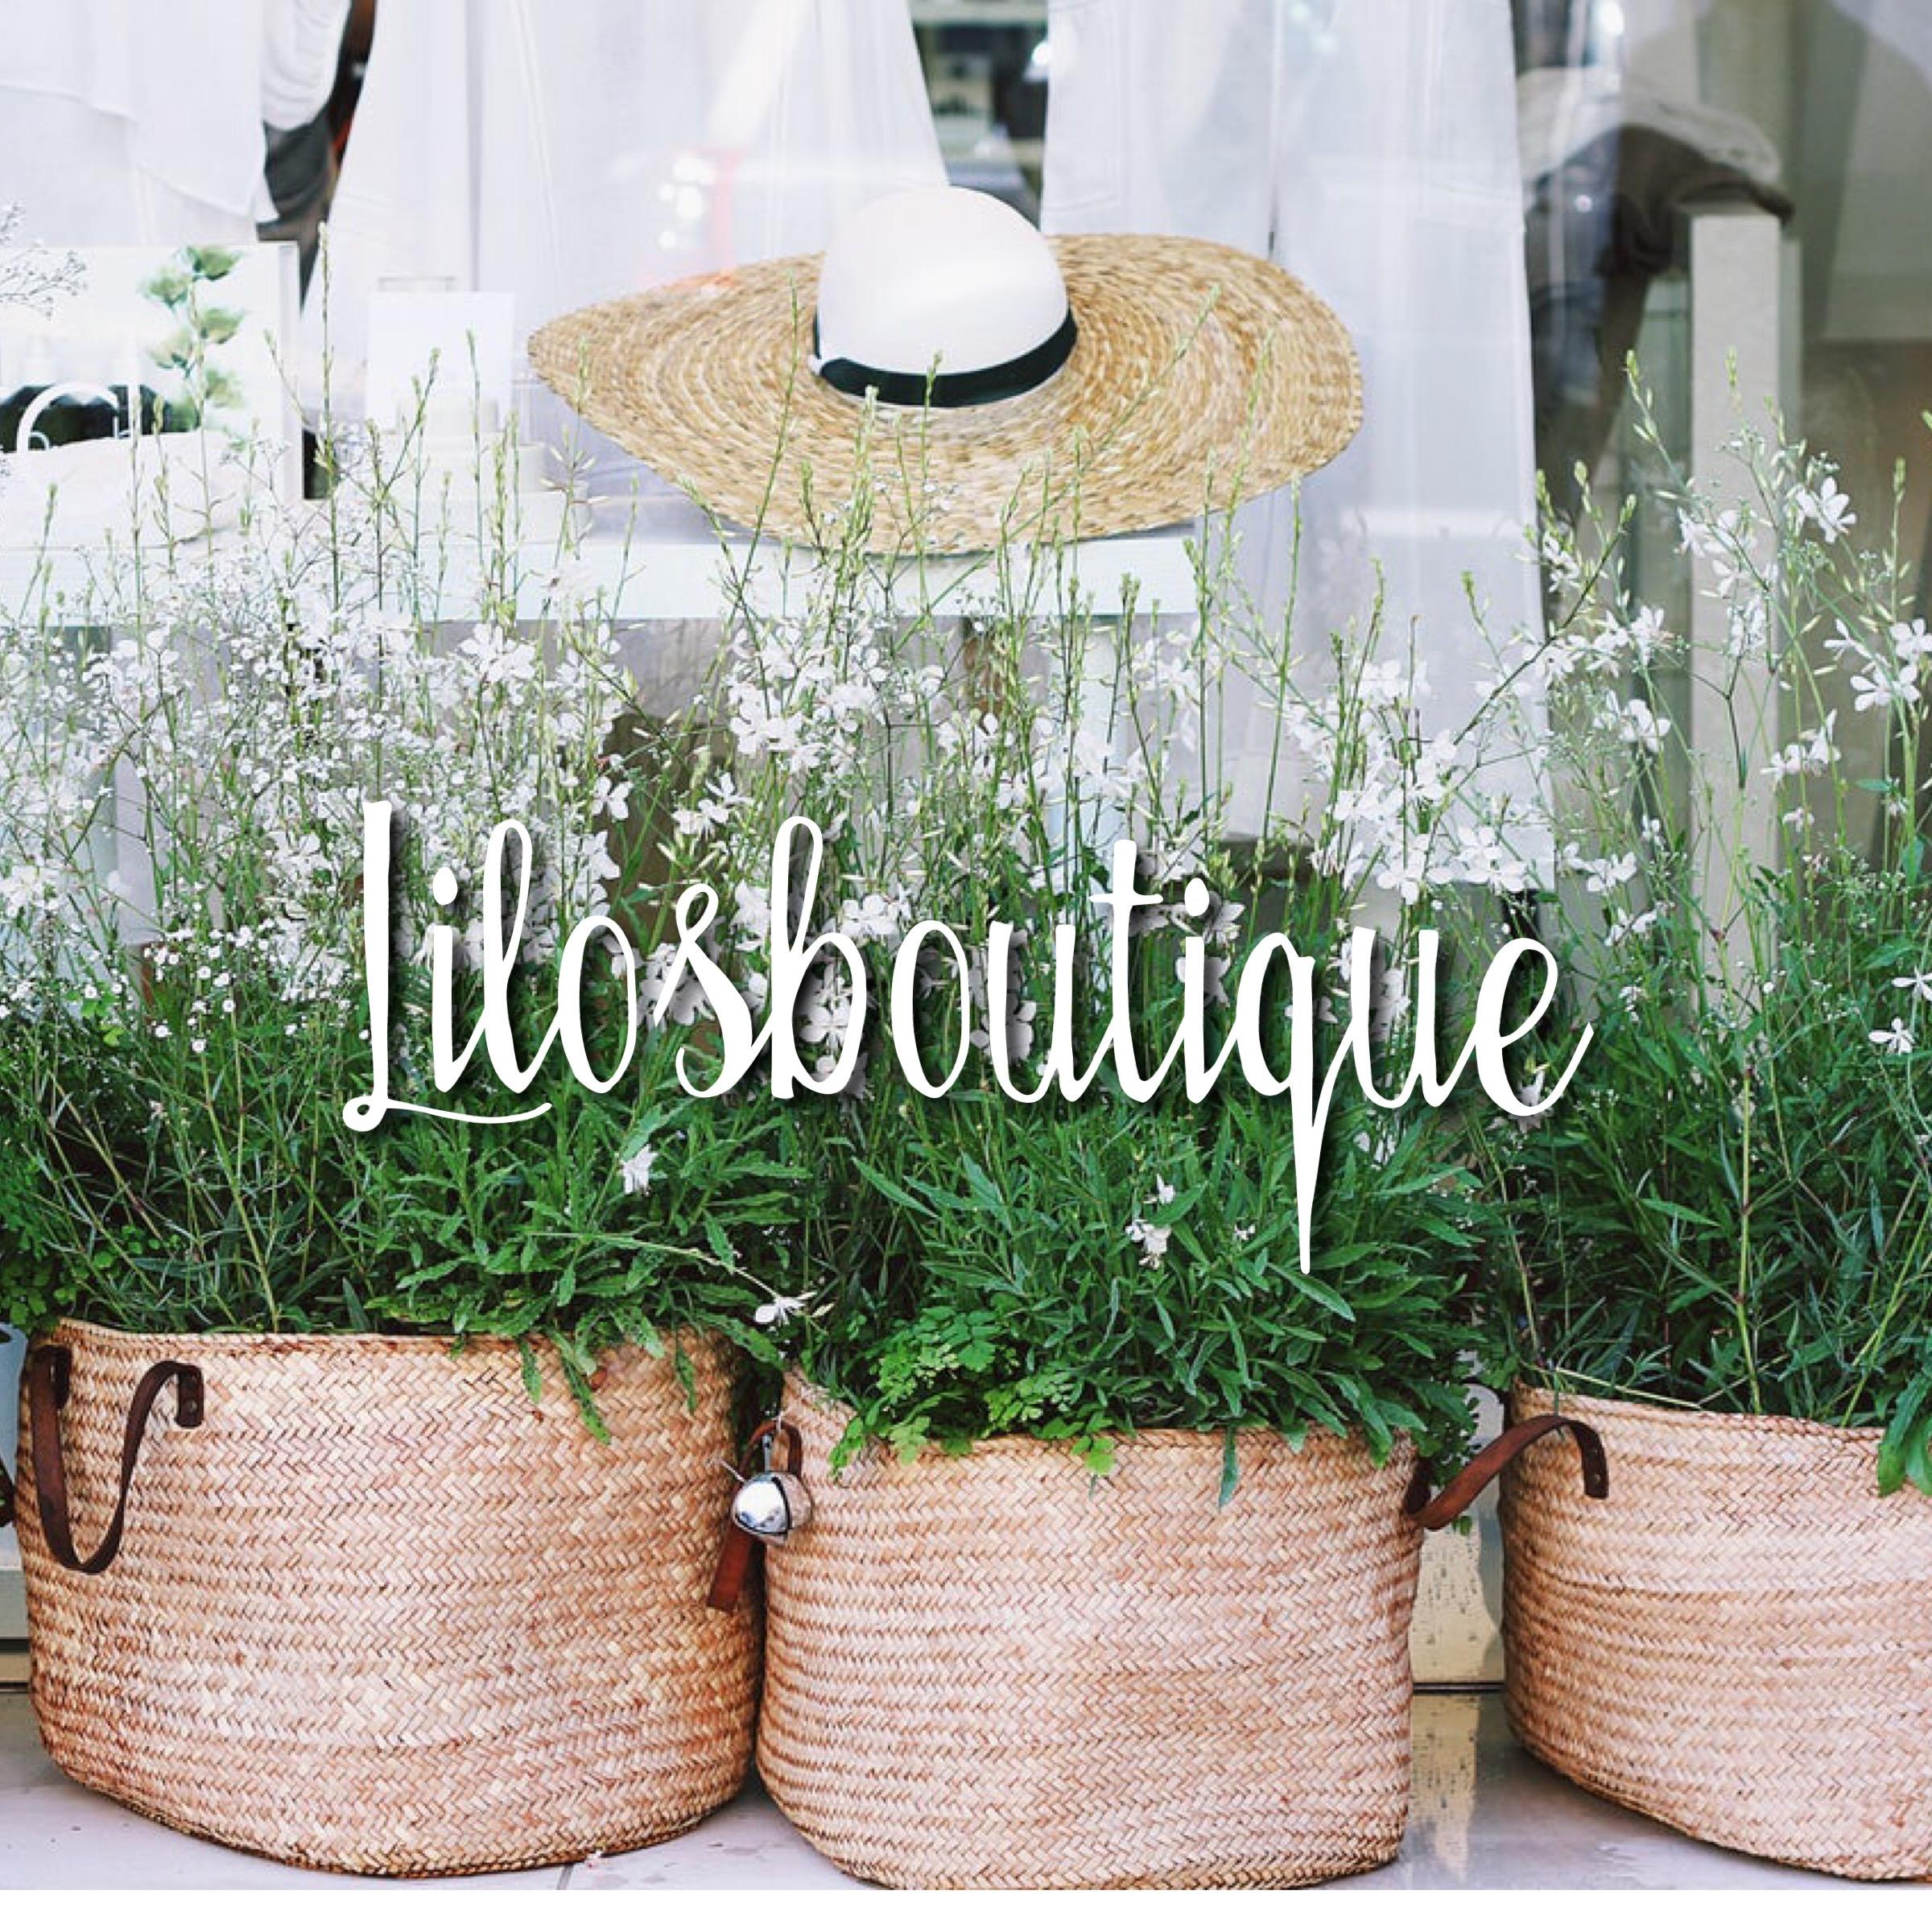 Lilosboutique